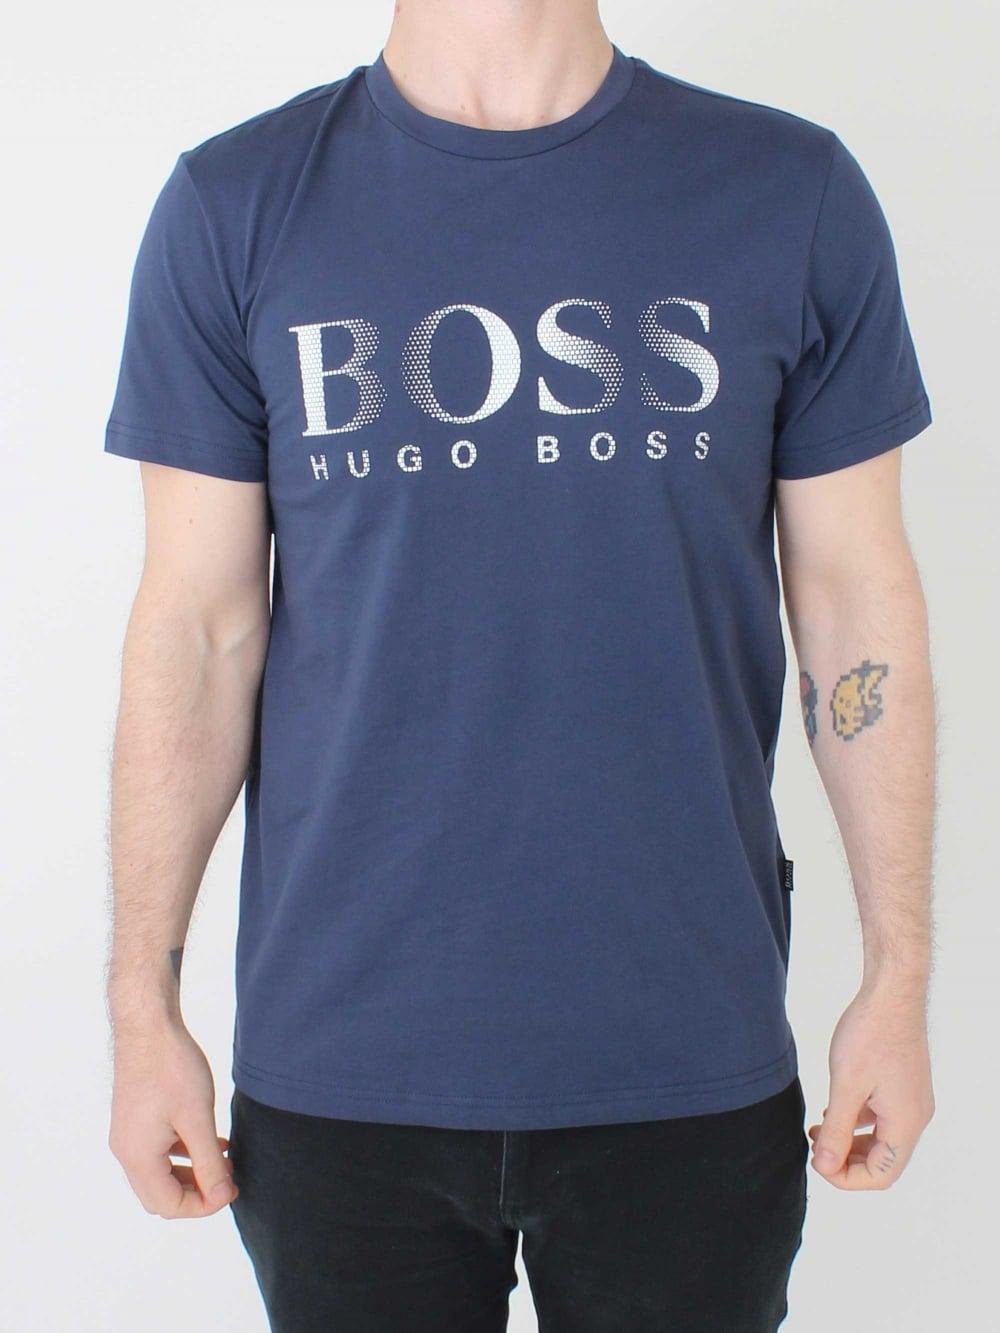 441c4884a Hugo Boss Regular Fit UV Logo T.Shirt in Navy | Northern Threads